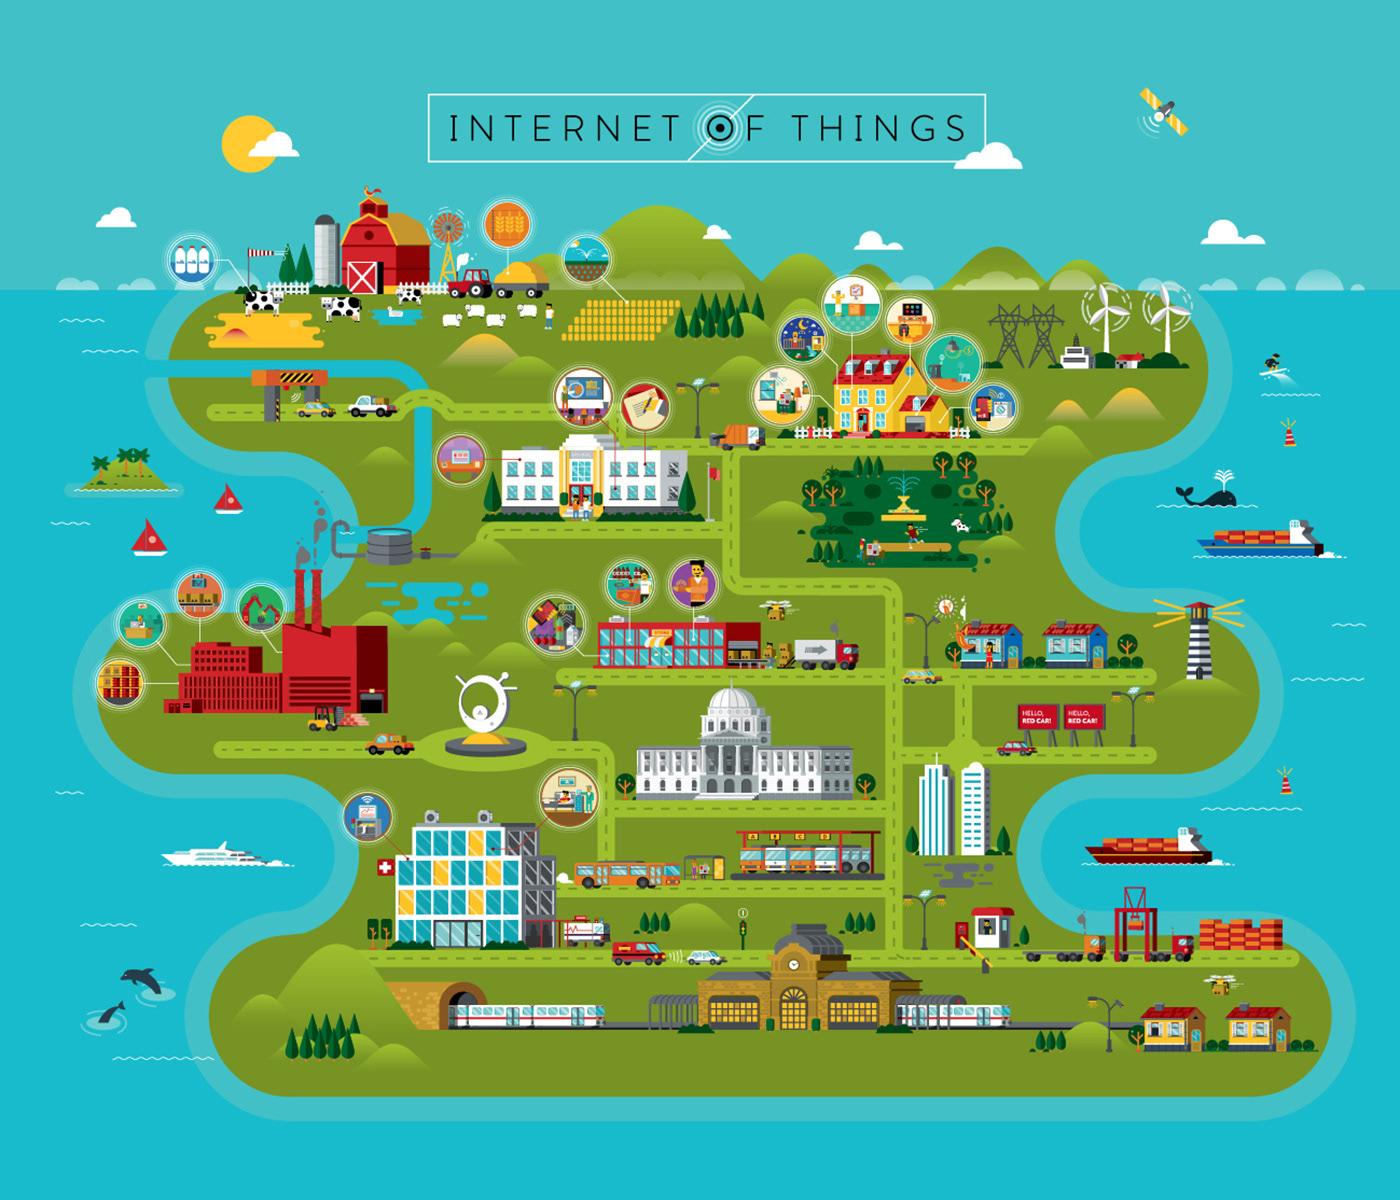 Kursat Unsal Graphic Designer Illustrator Internet Of Things